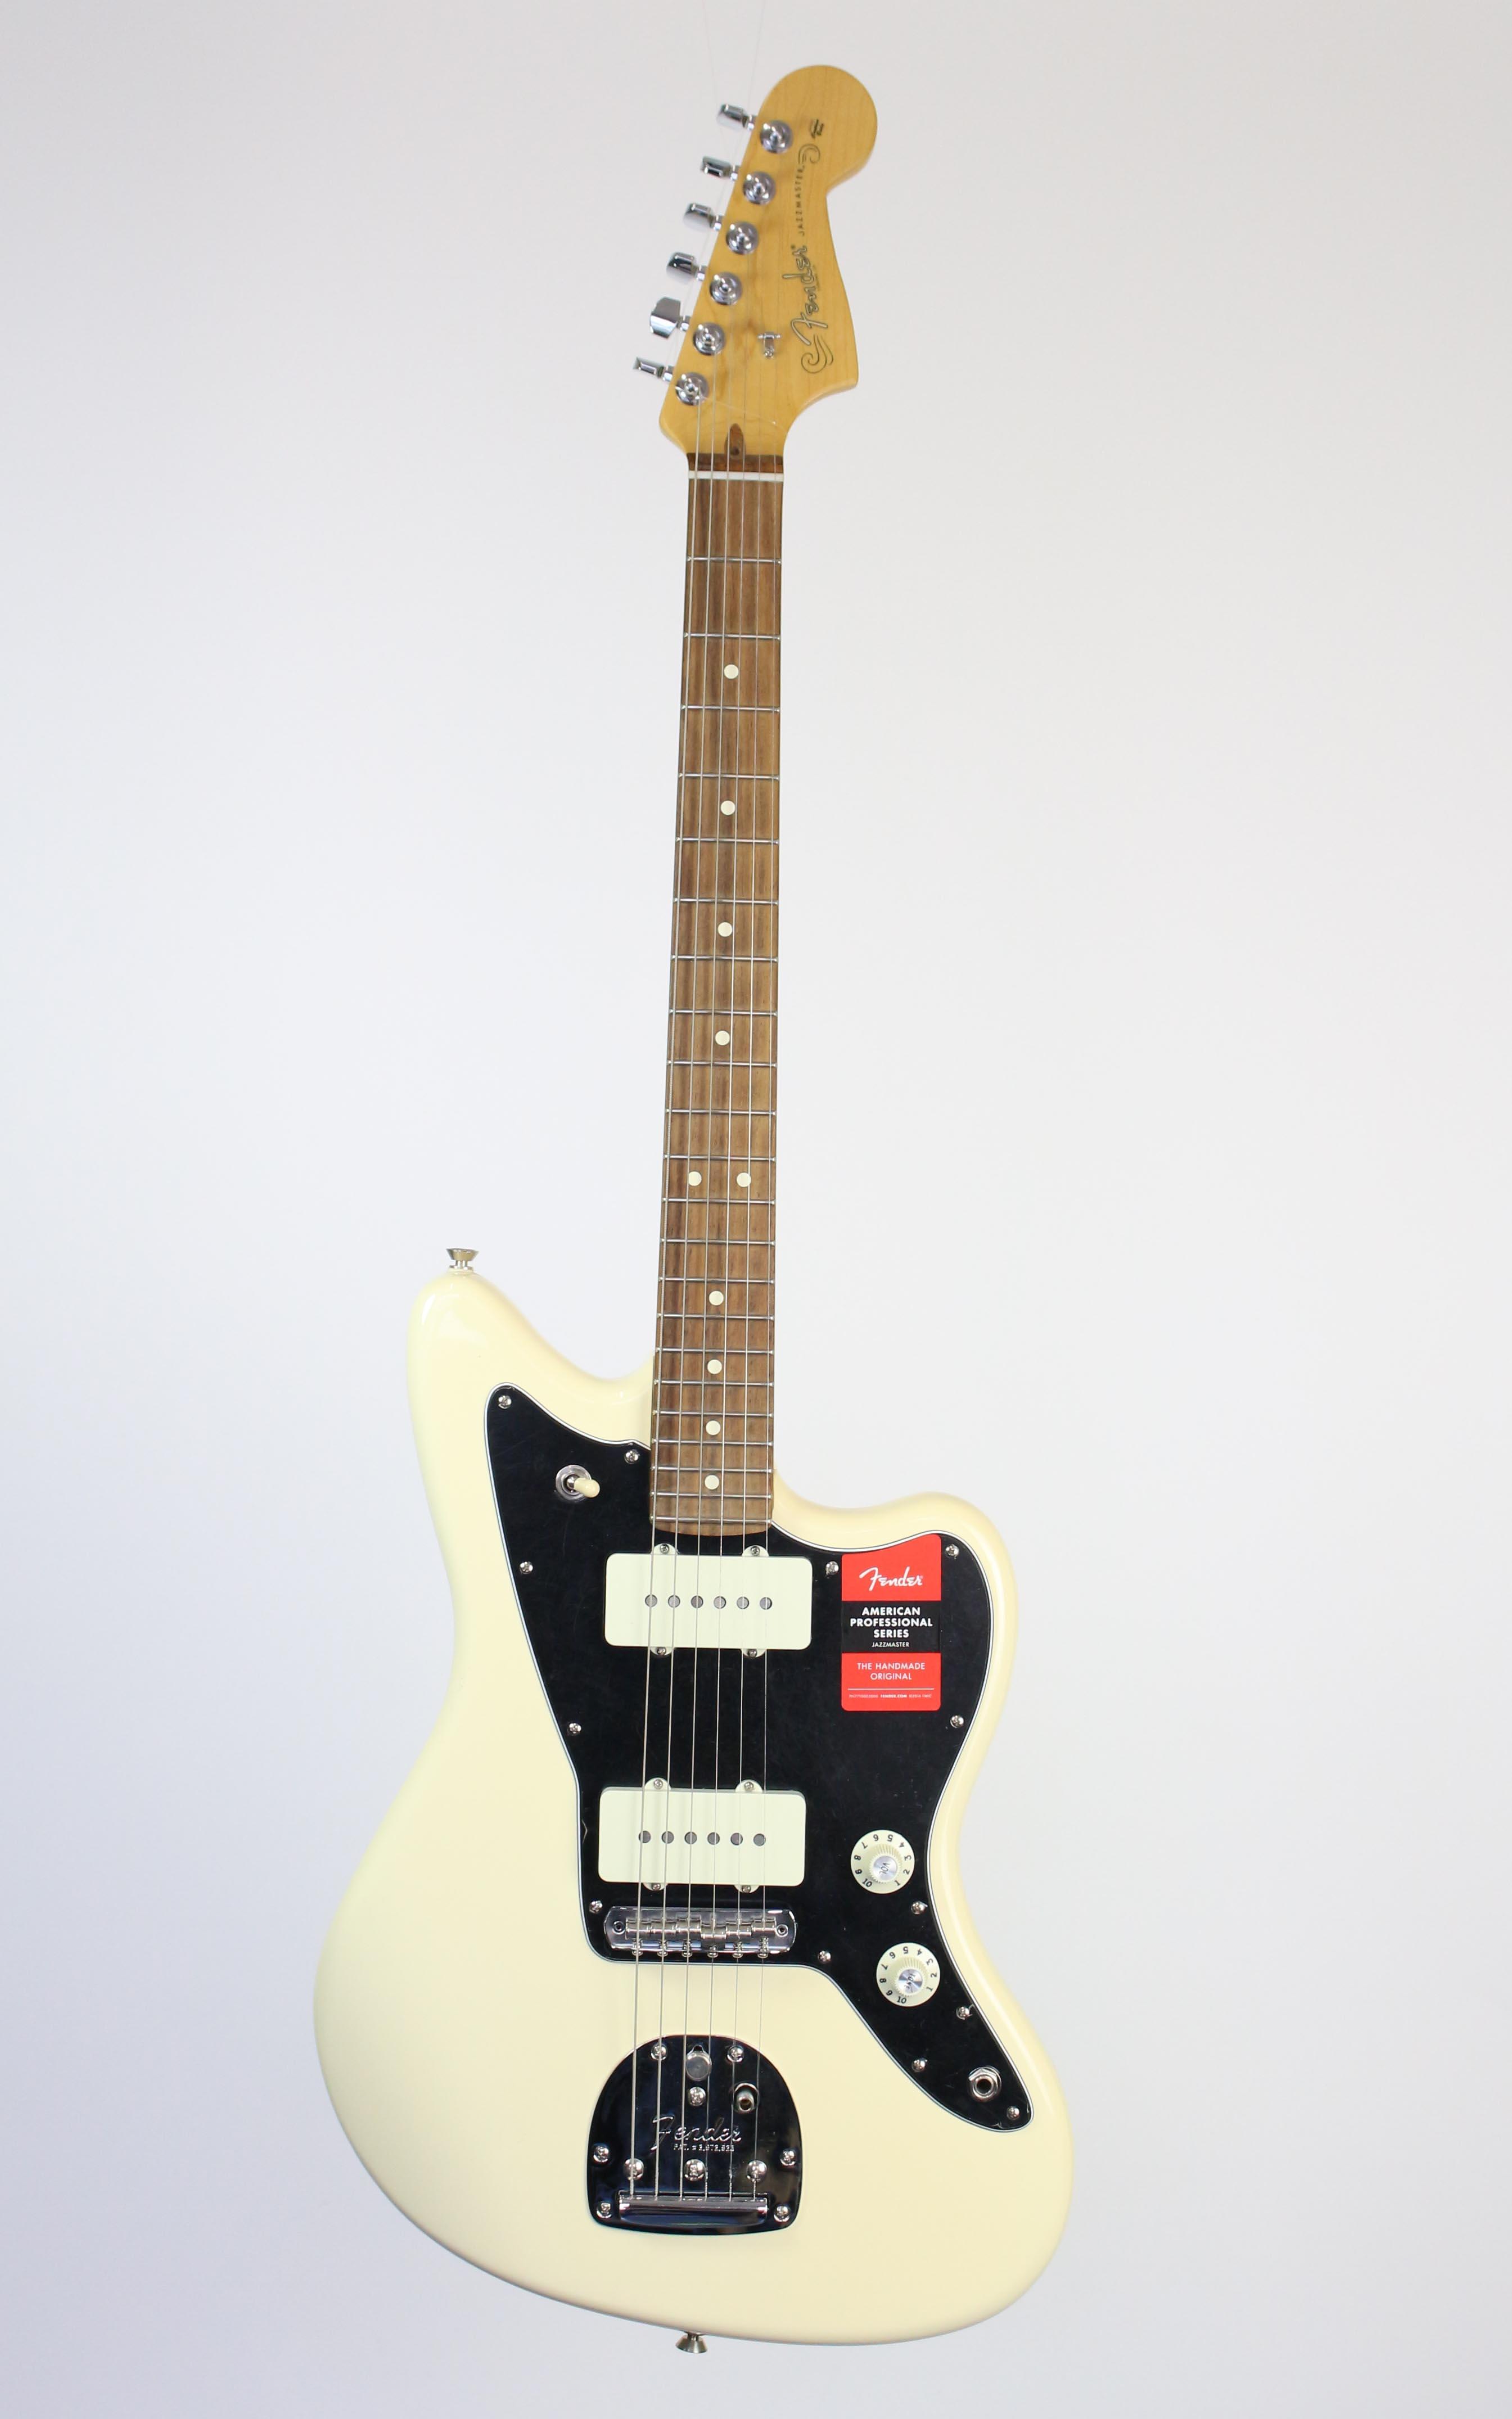 Fender - American Pro Jazzmaster RW Olympic White - Gitarren - E-Gitarren | MUSIK BERTRAM Deutschland Freiburg